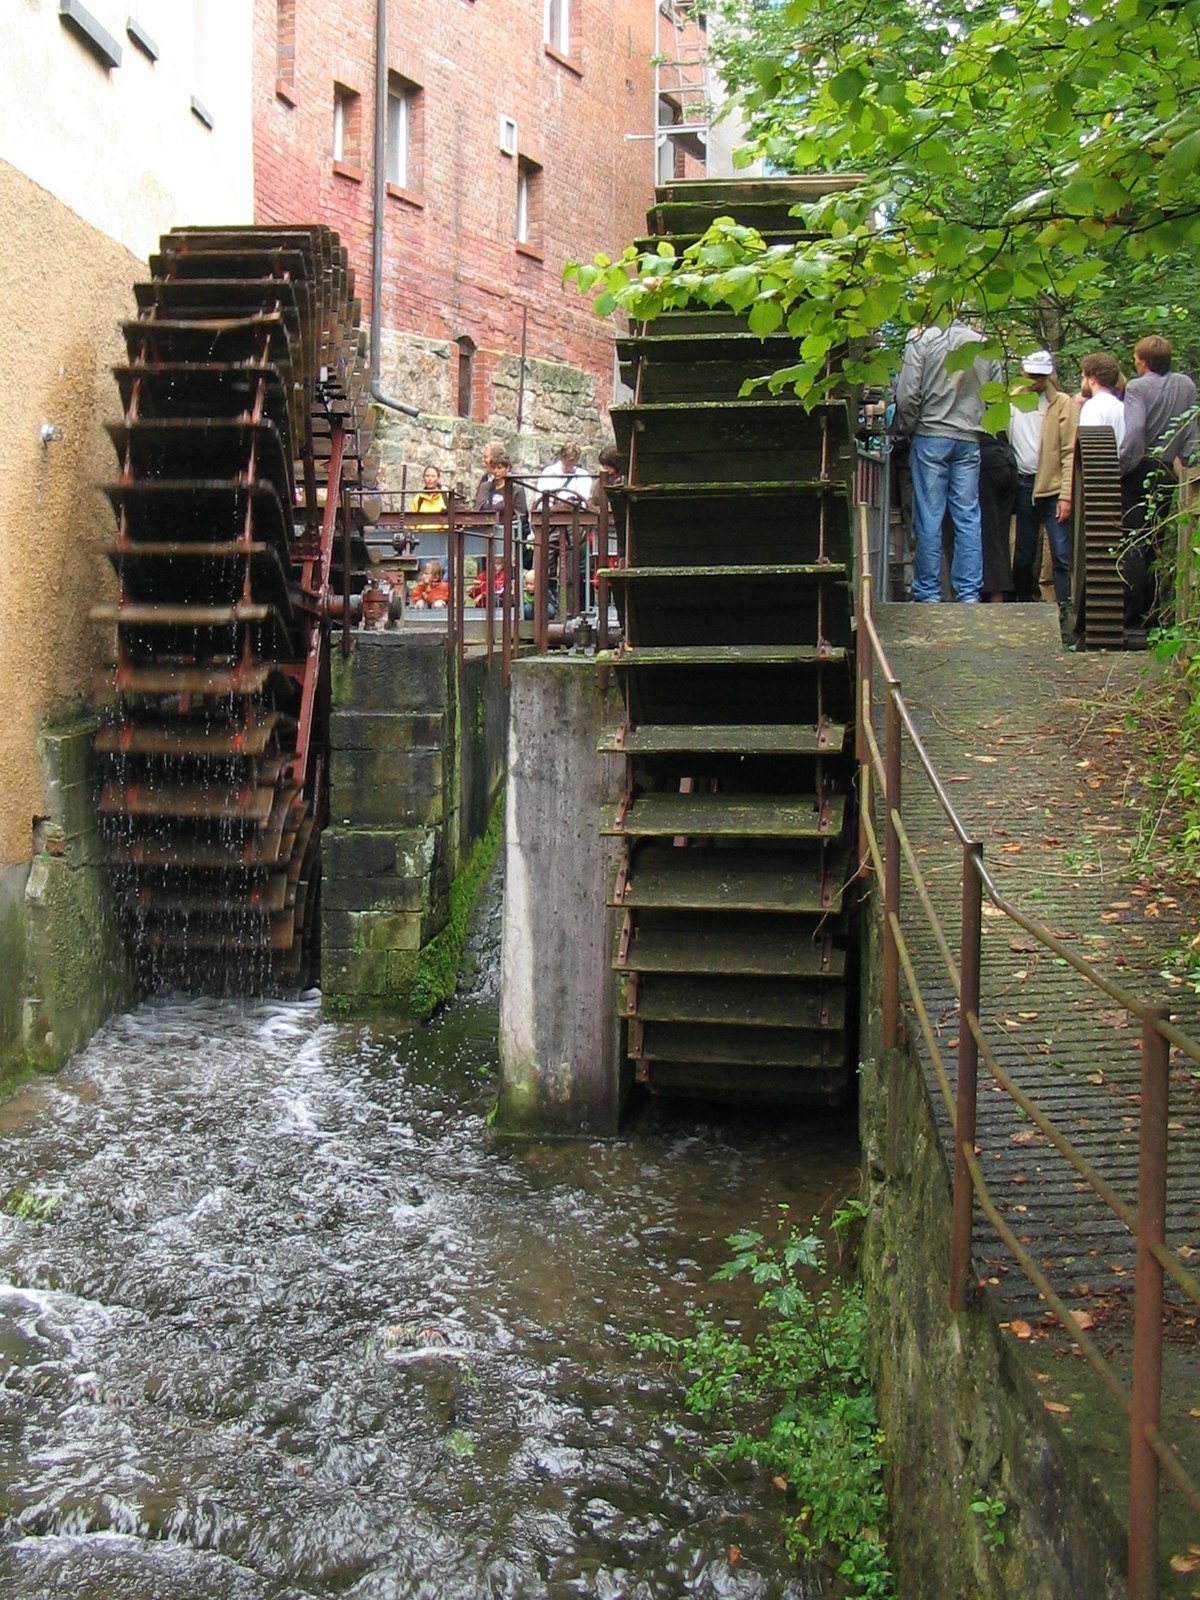 Energ a hidr ulica wikipedia la enciclopedia libre for Construccion de piletas de agua